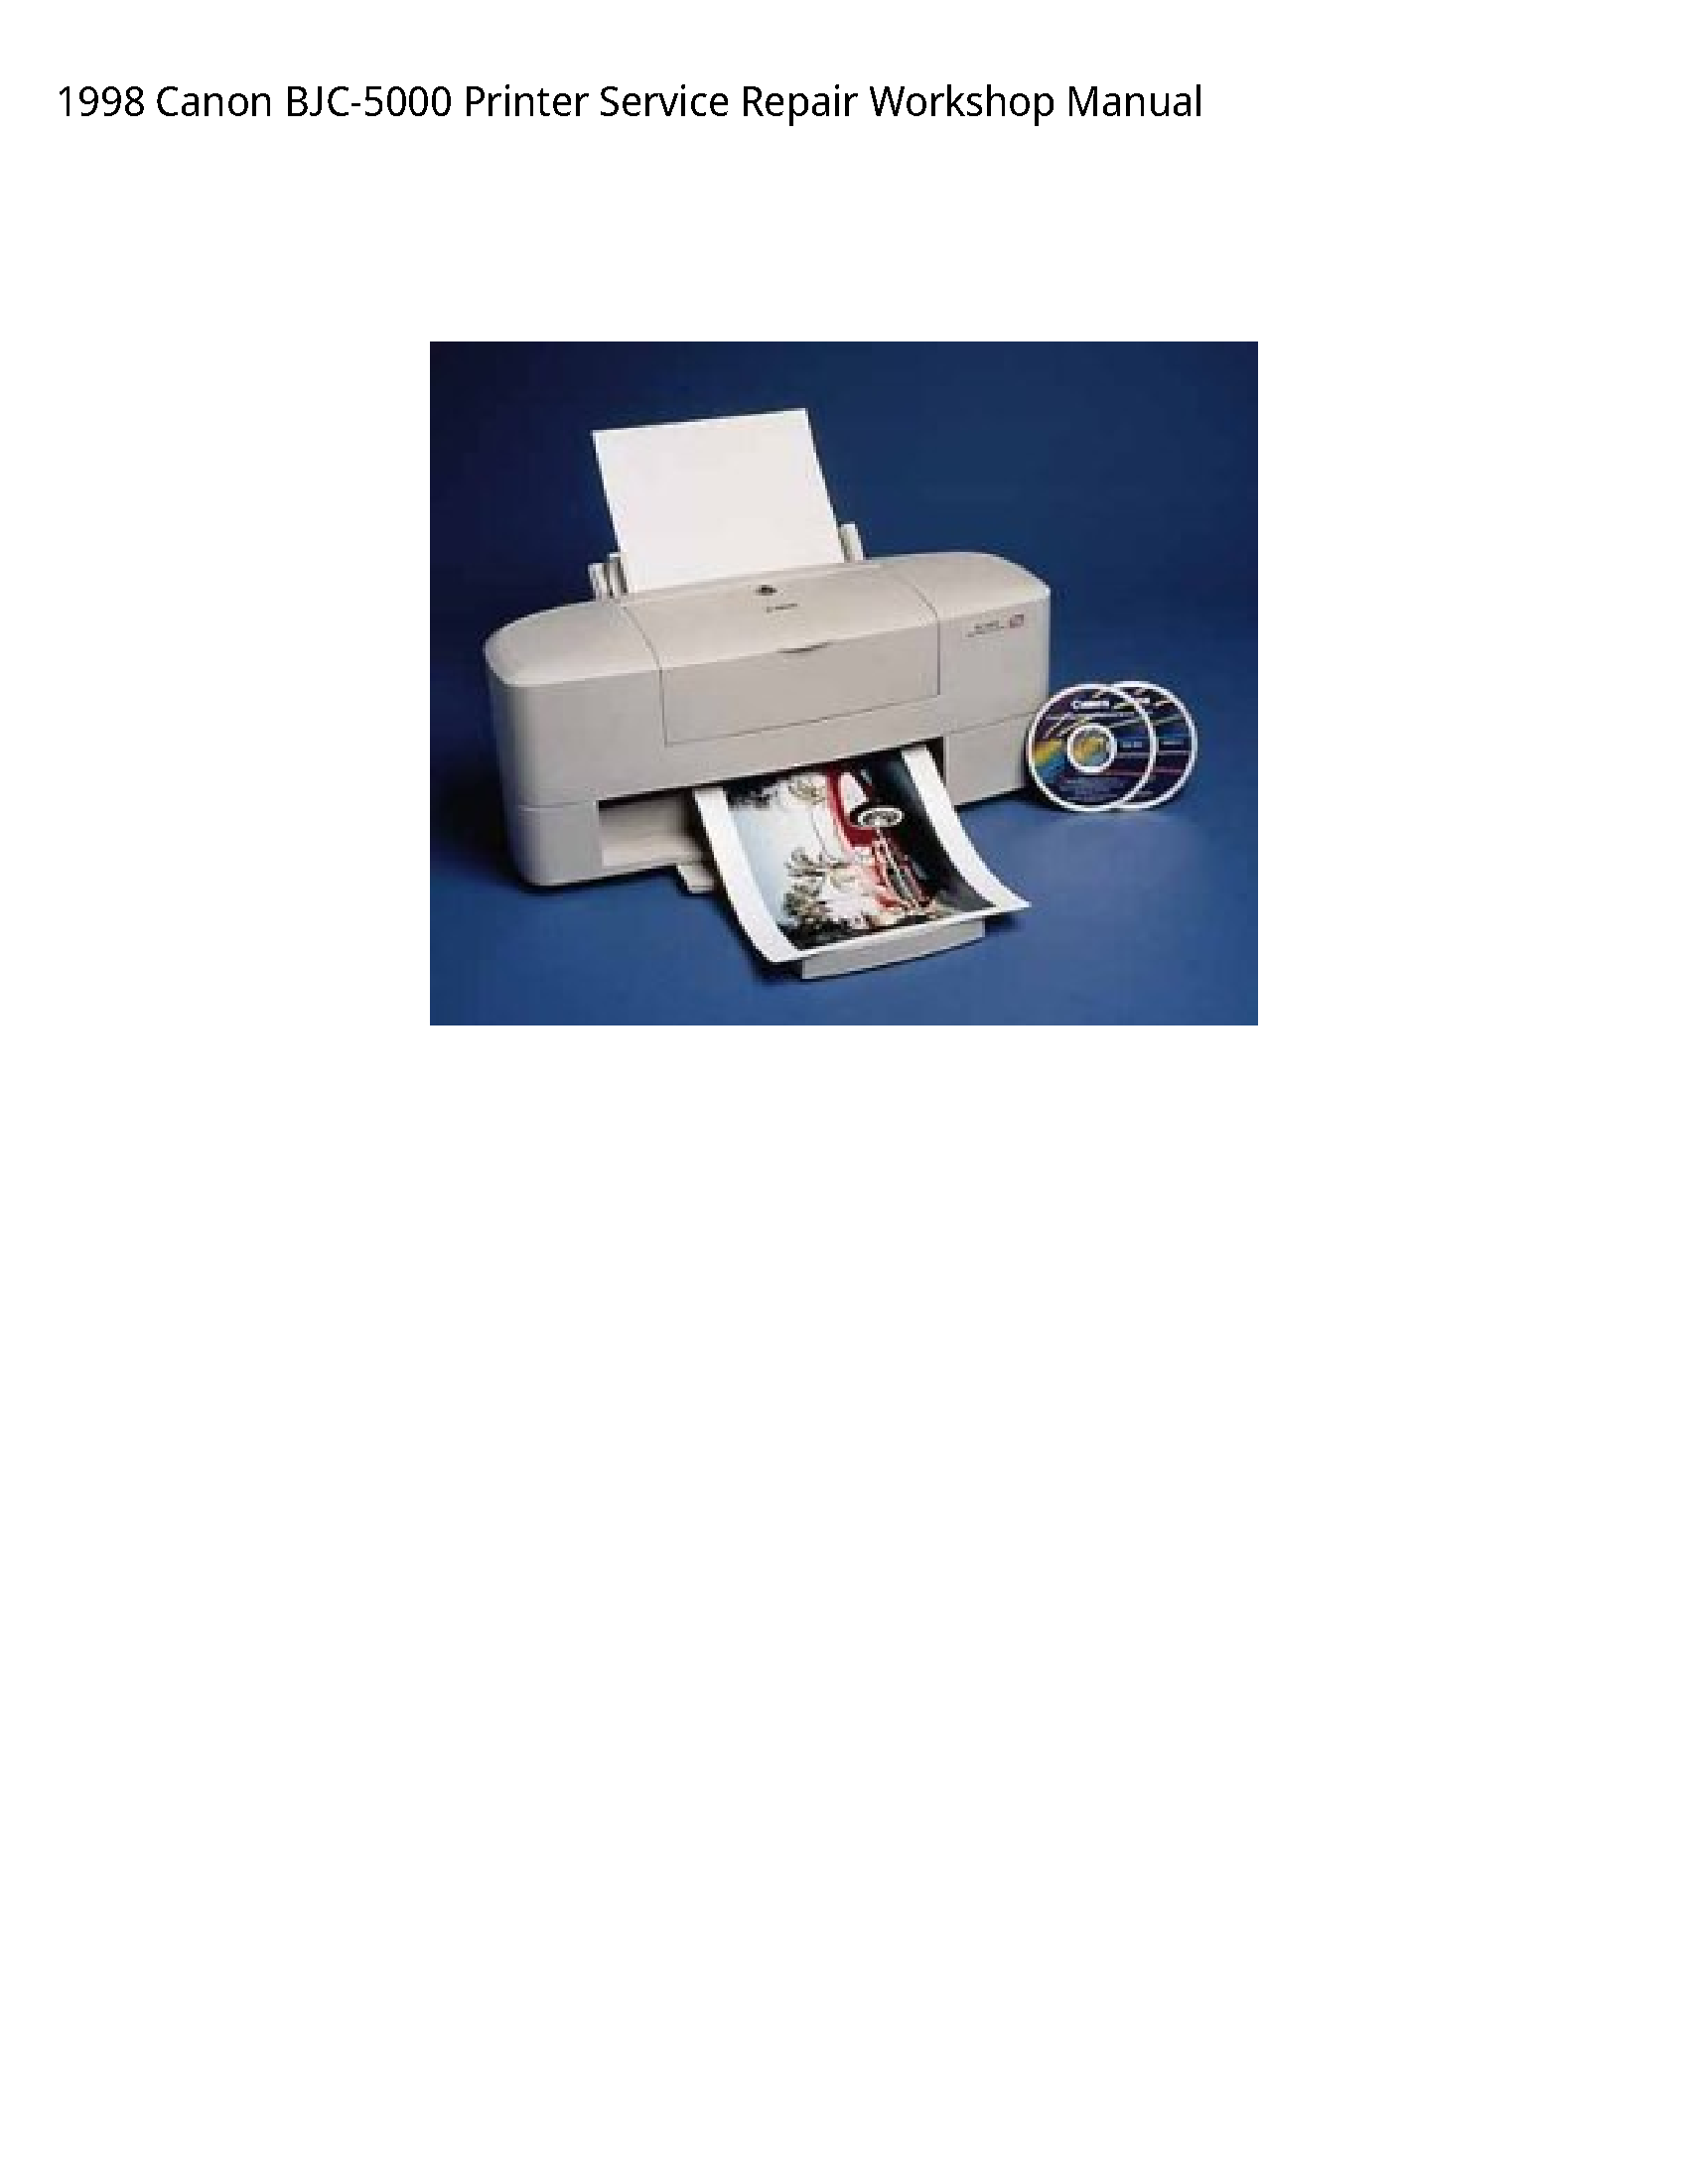 Canon BJC-5000 Printer manual